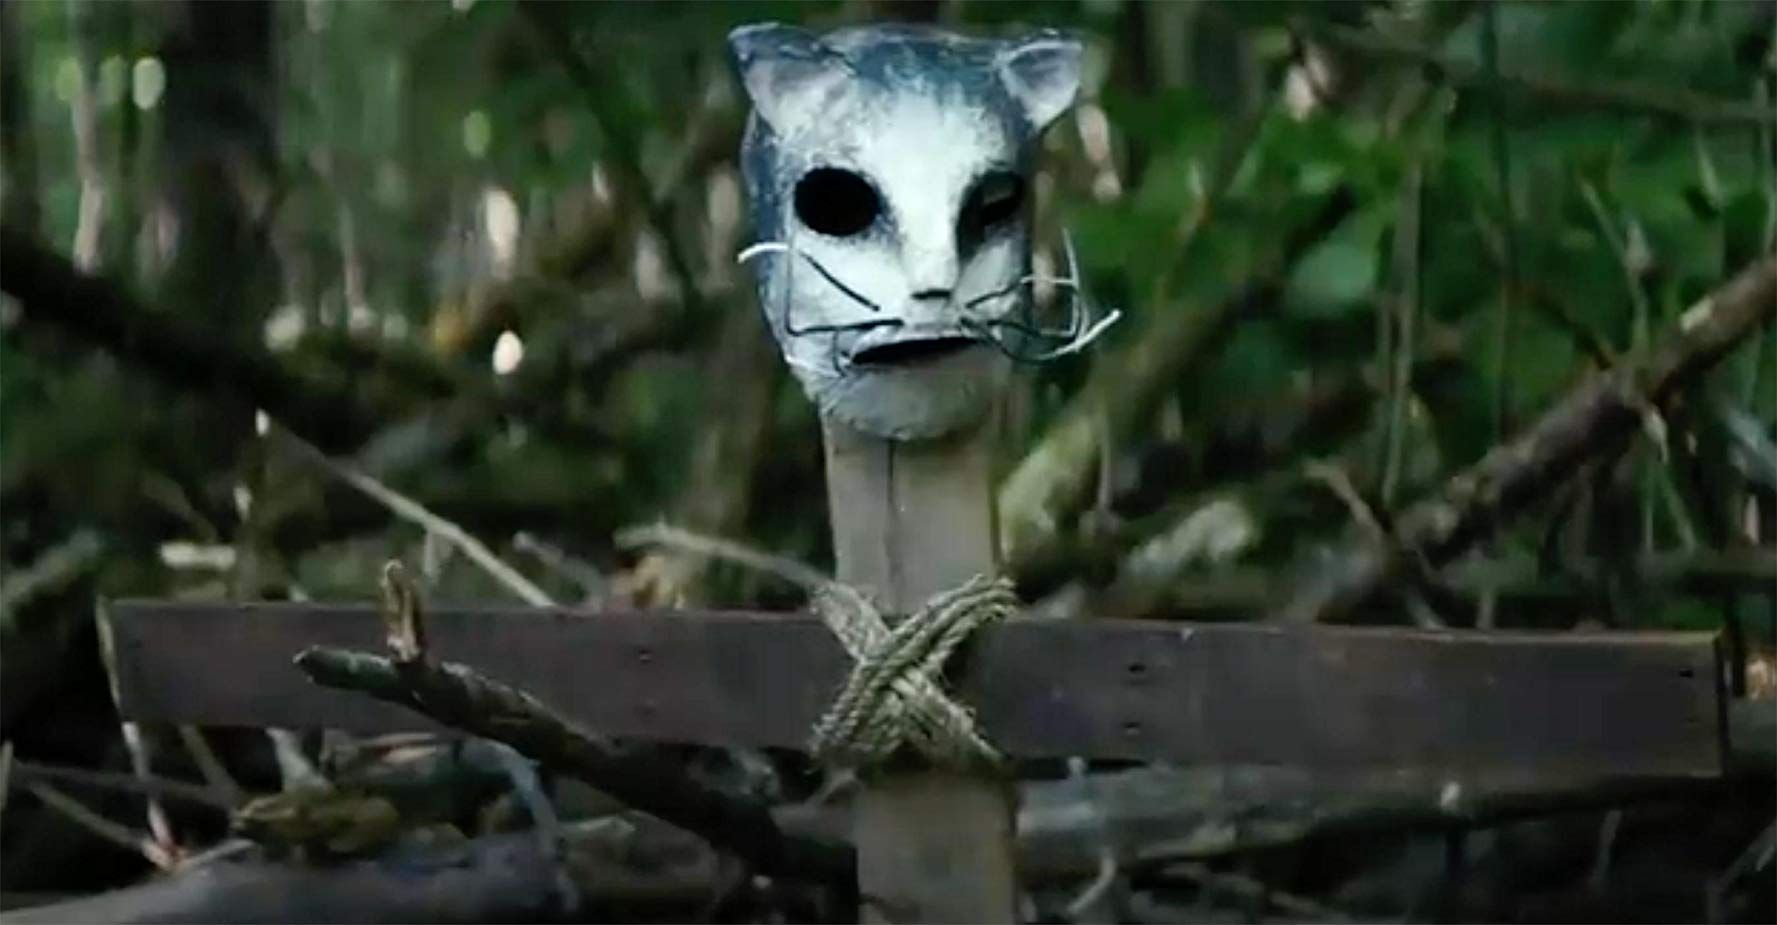 Pin On Ver Pelicula Cementerio De Animales Pelicula Completa Online En Español Subtitulada